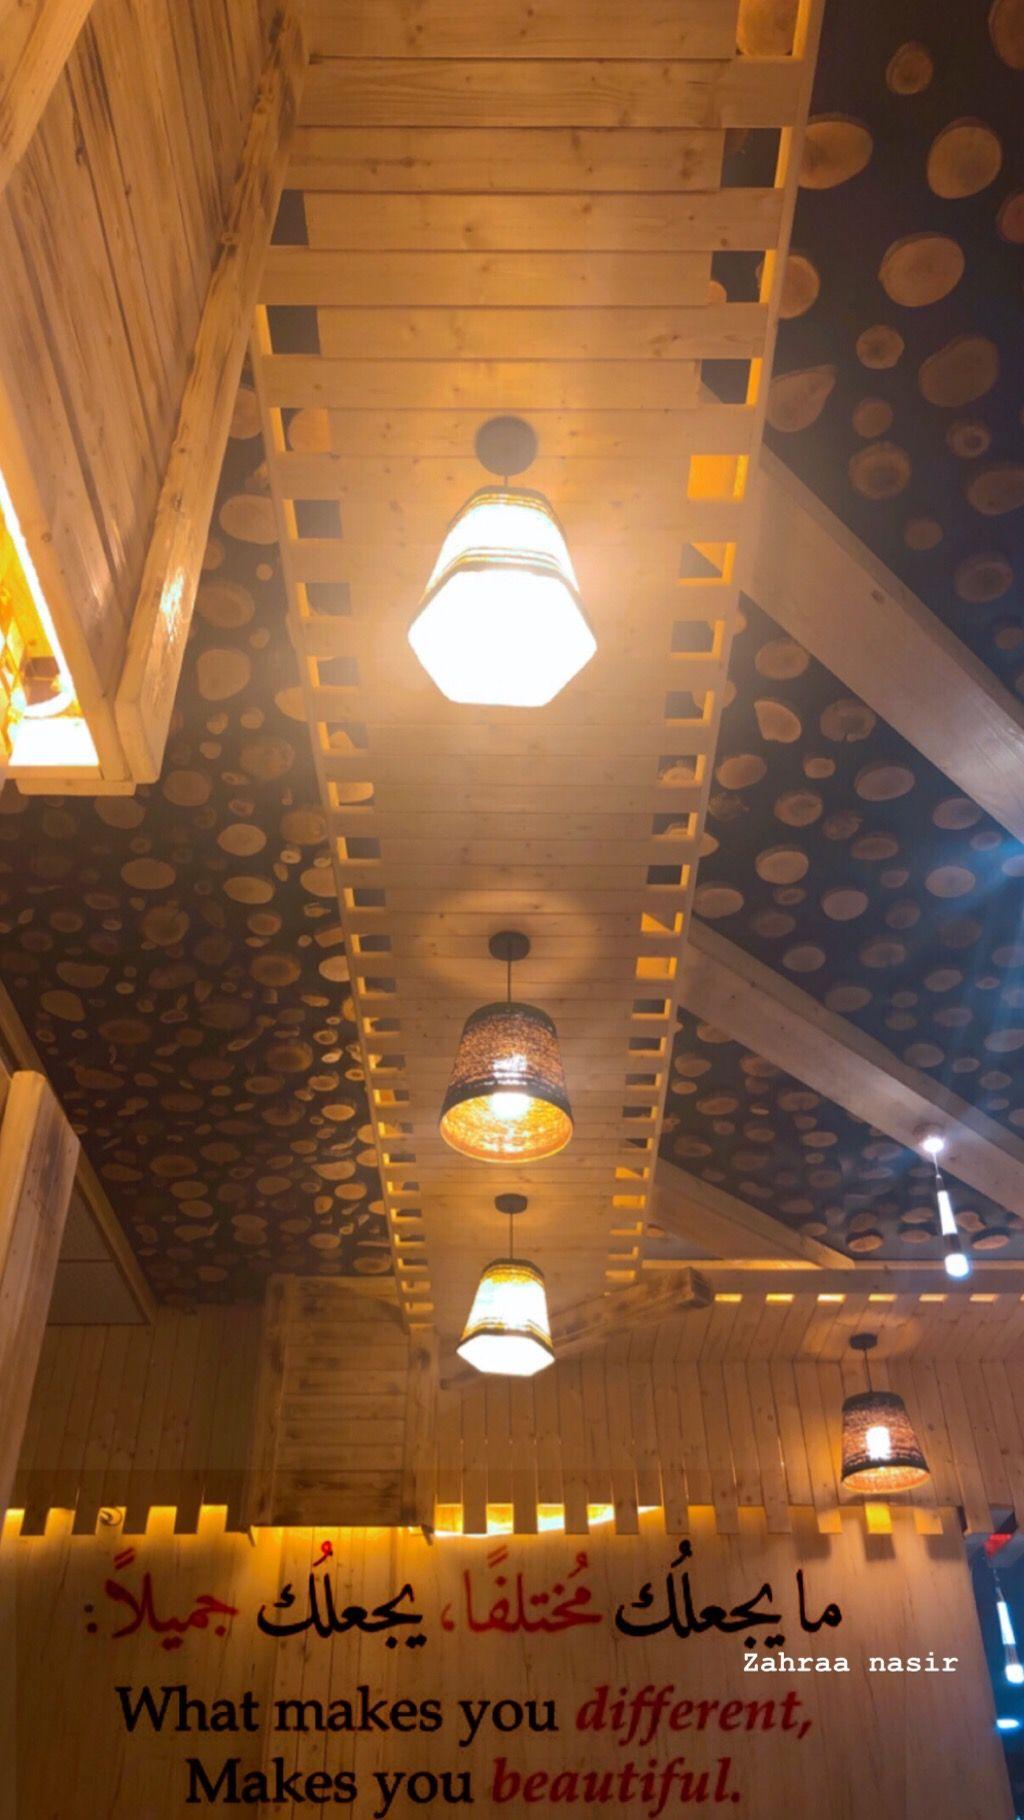 Quotes كلمات كلمات أعجبتني كلمات راقت لي قوة مختارات Lifequotes عبارات جمال كوفي كلاسيك Decor Ceiling Lights Home Decor Decor